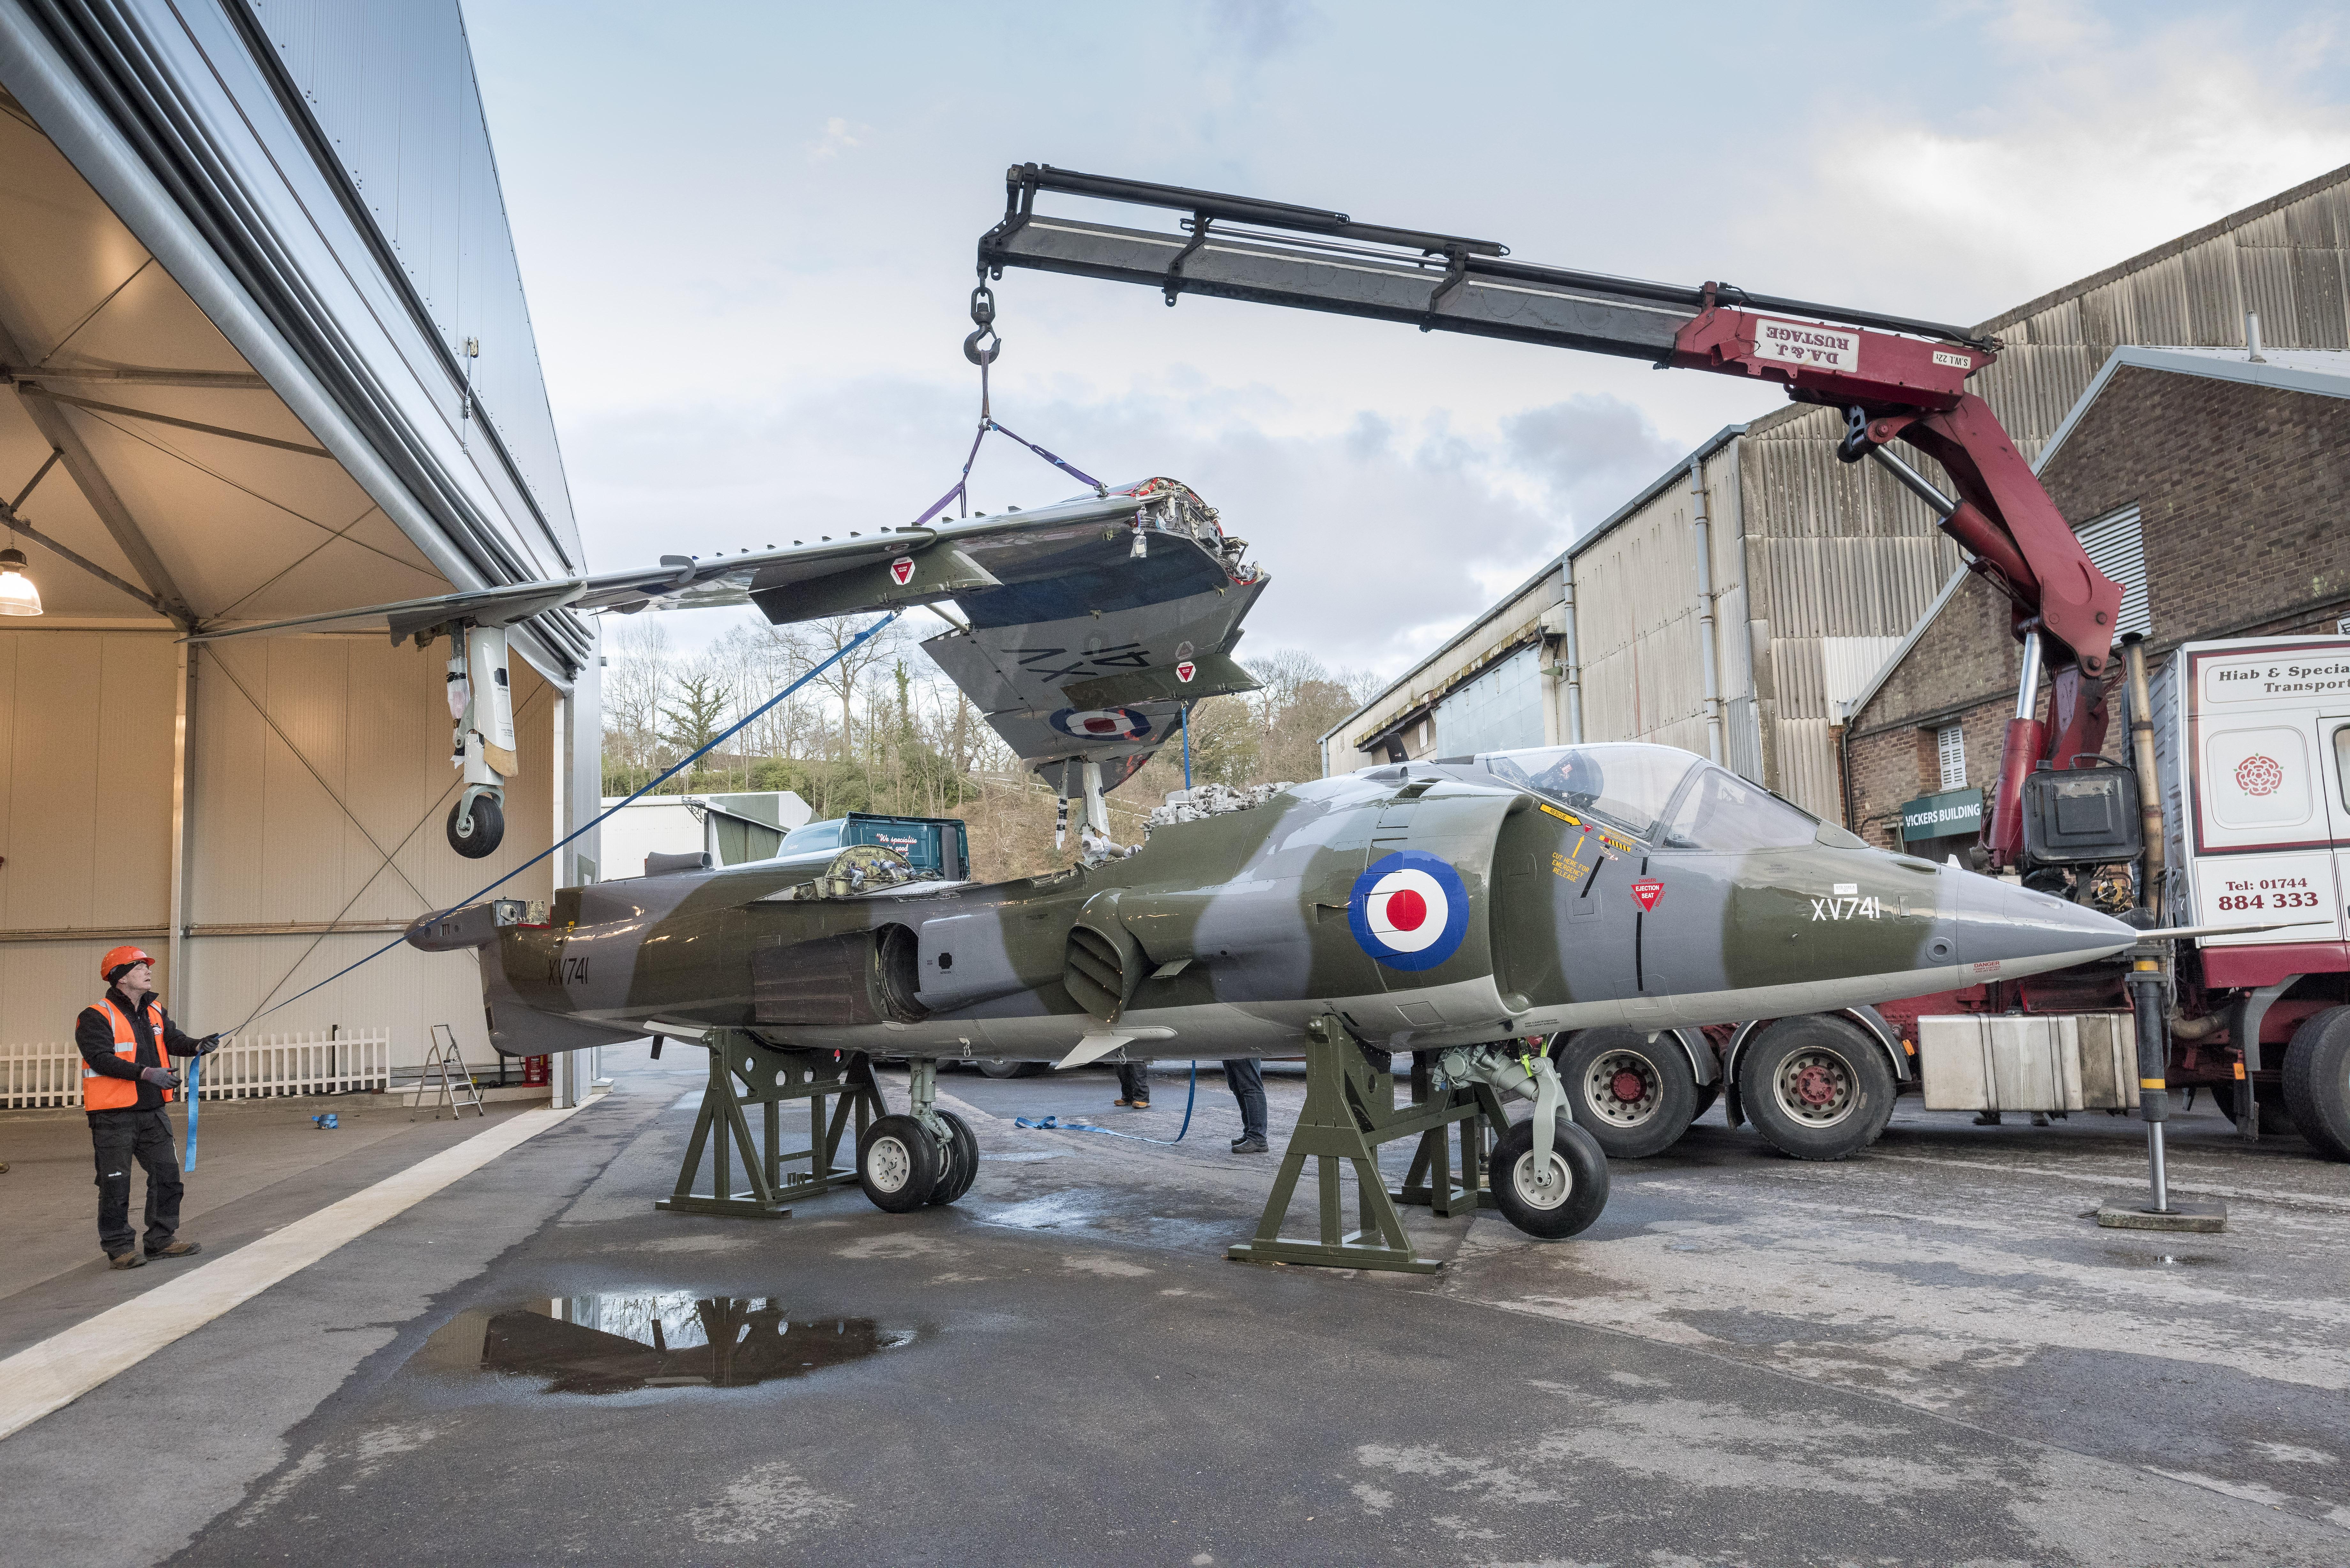 Air Race Harrier Rebuild